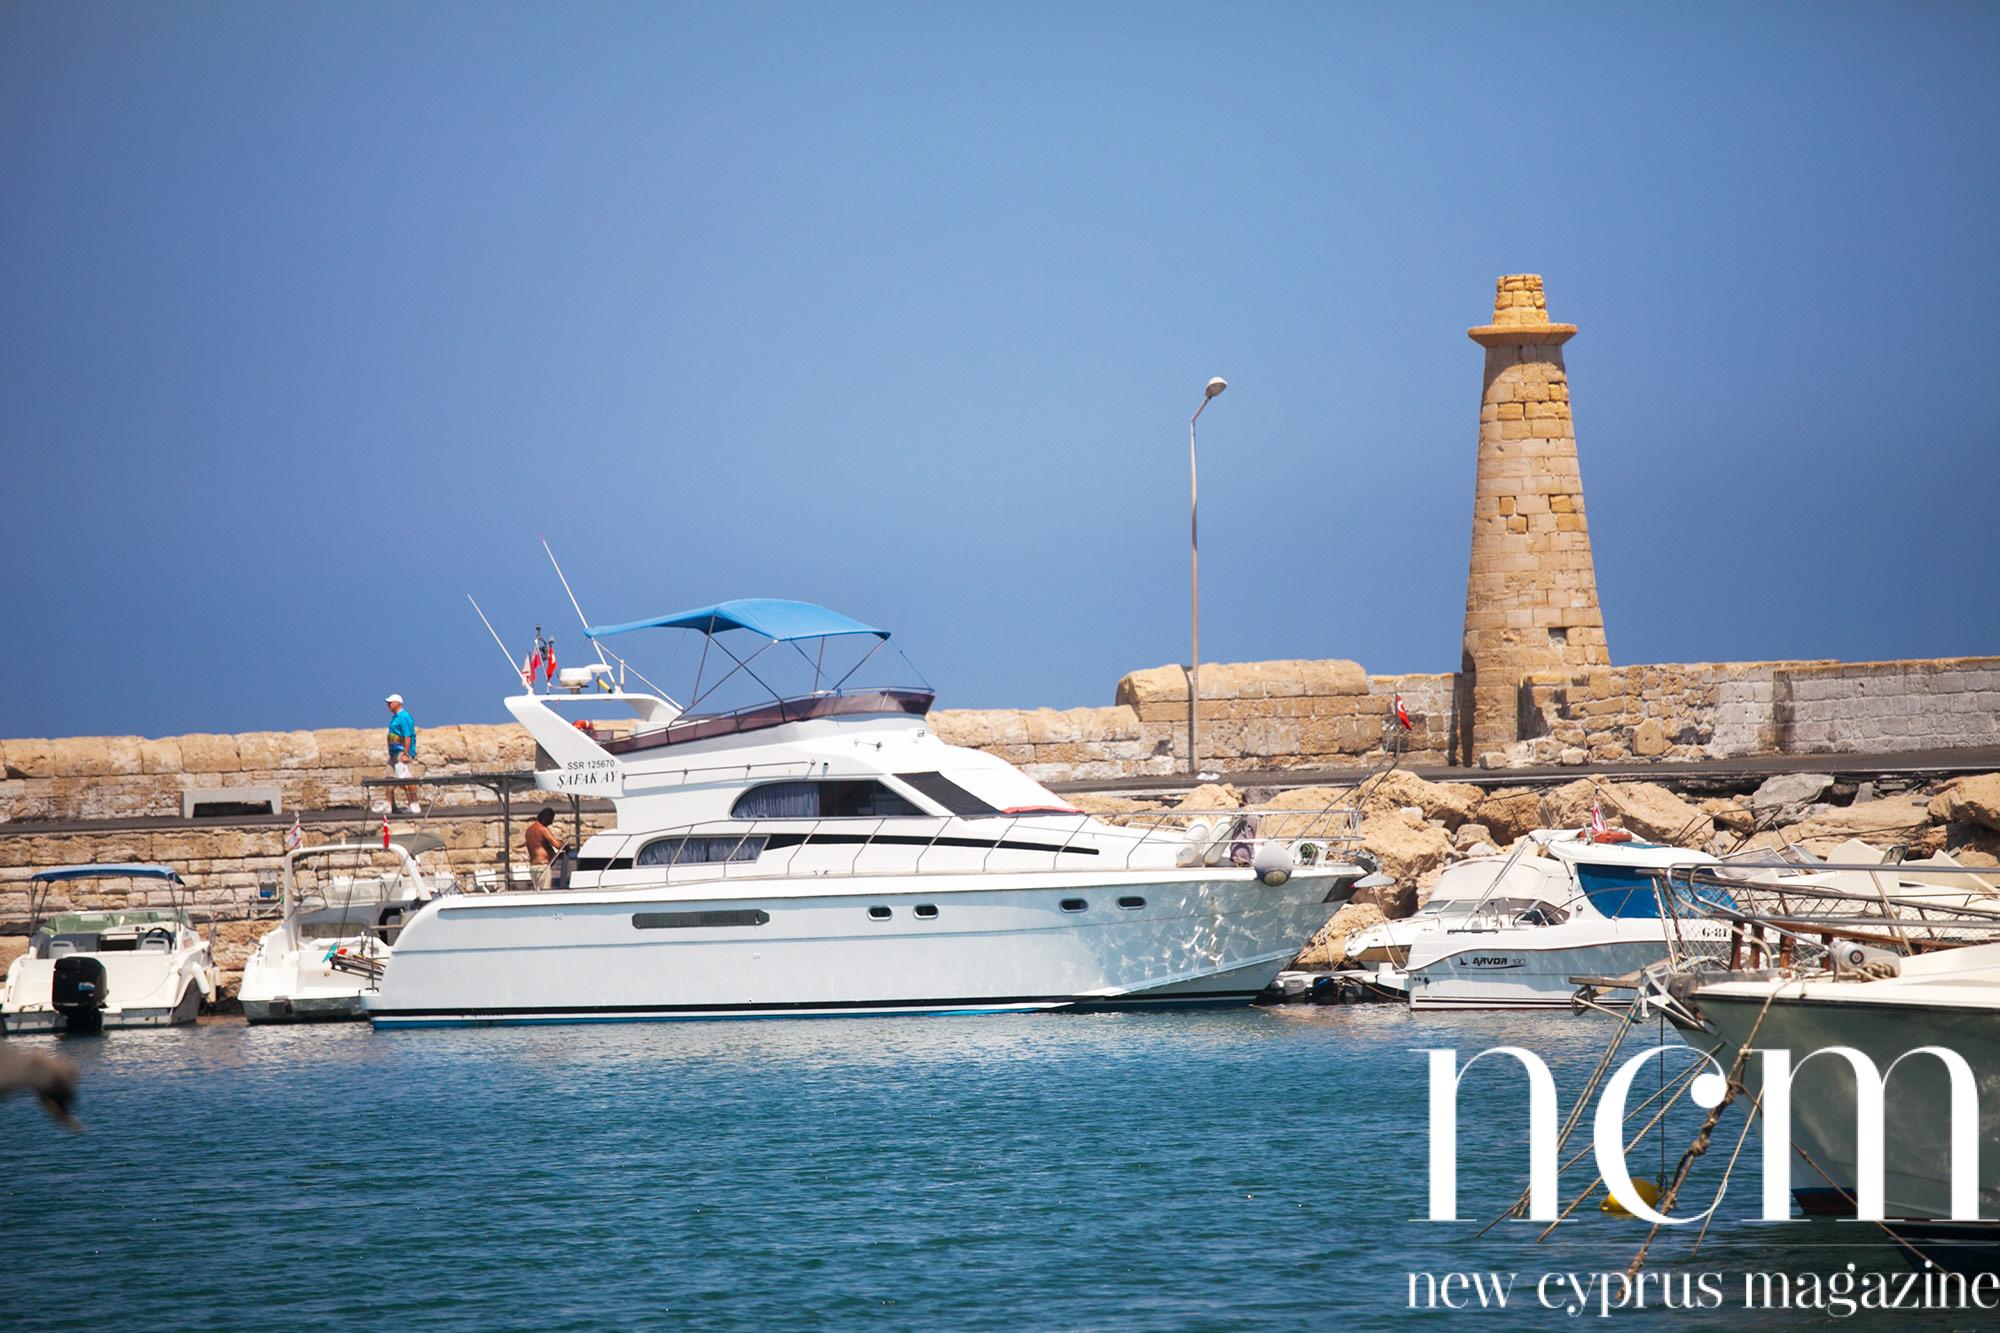 Boats in Kyrenia harbour